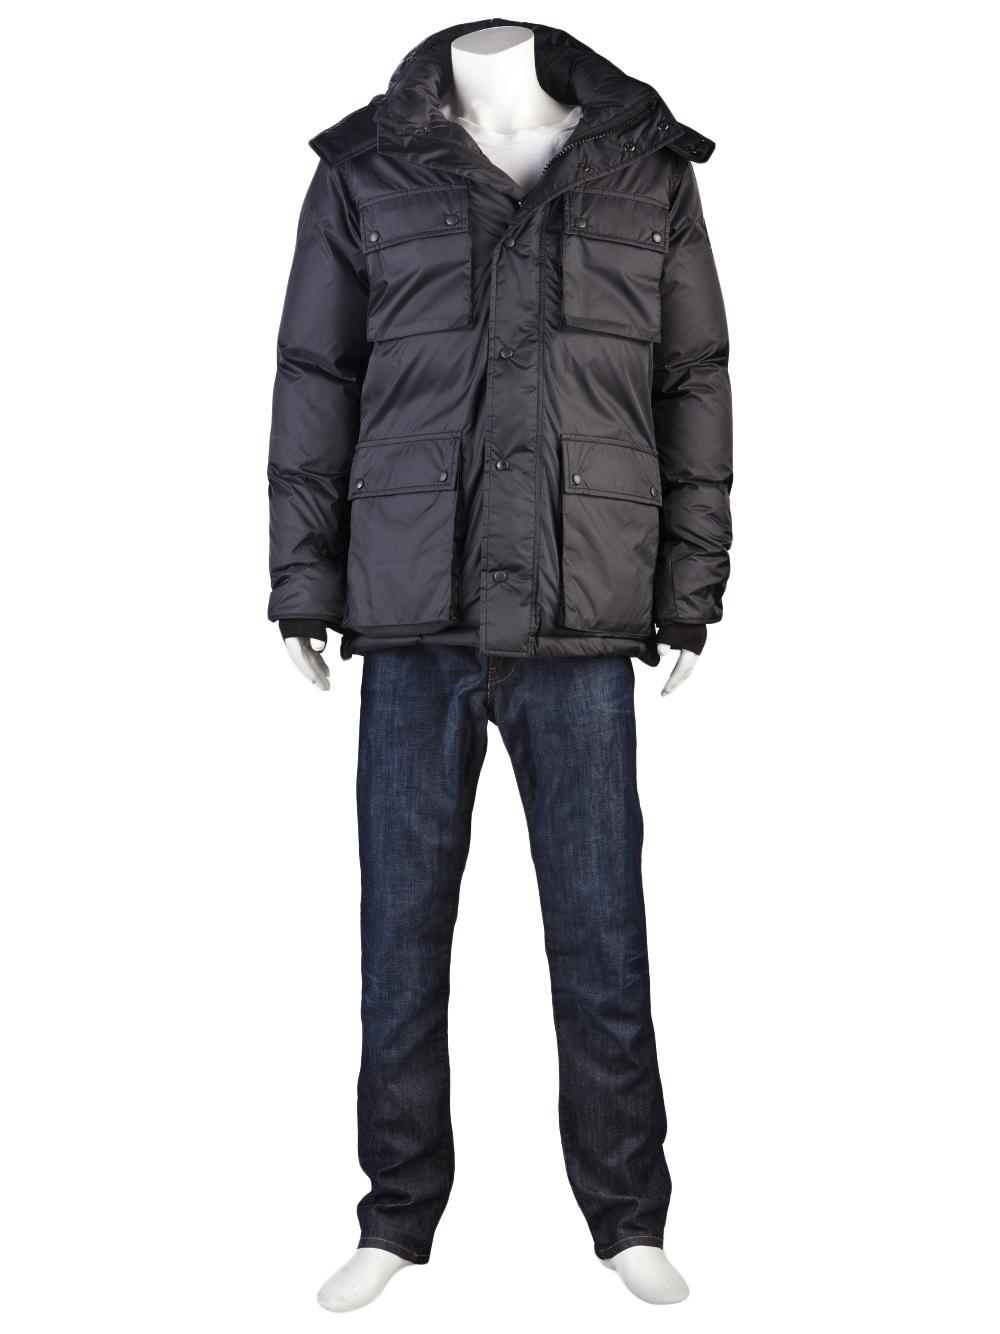 Canada Goose Manitoba Jacket in Gray for Men - Lyst f2e6df61dbf5